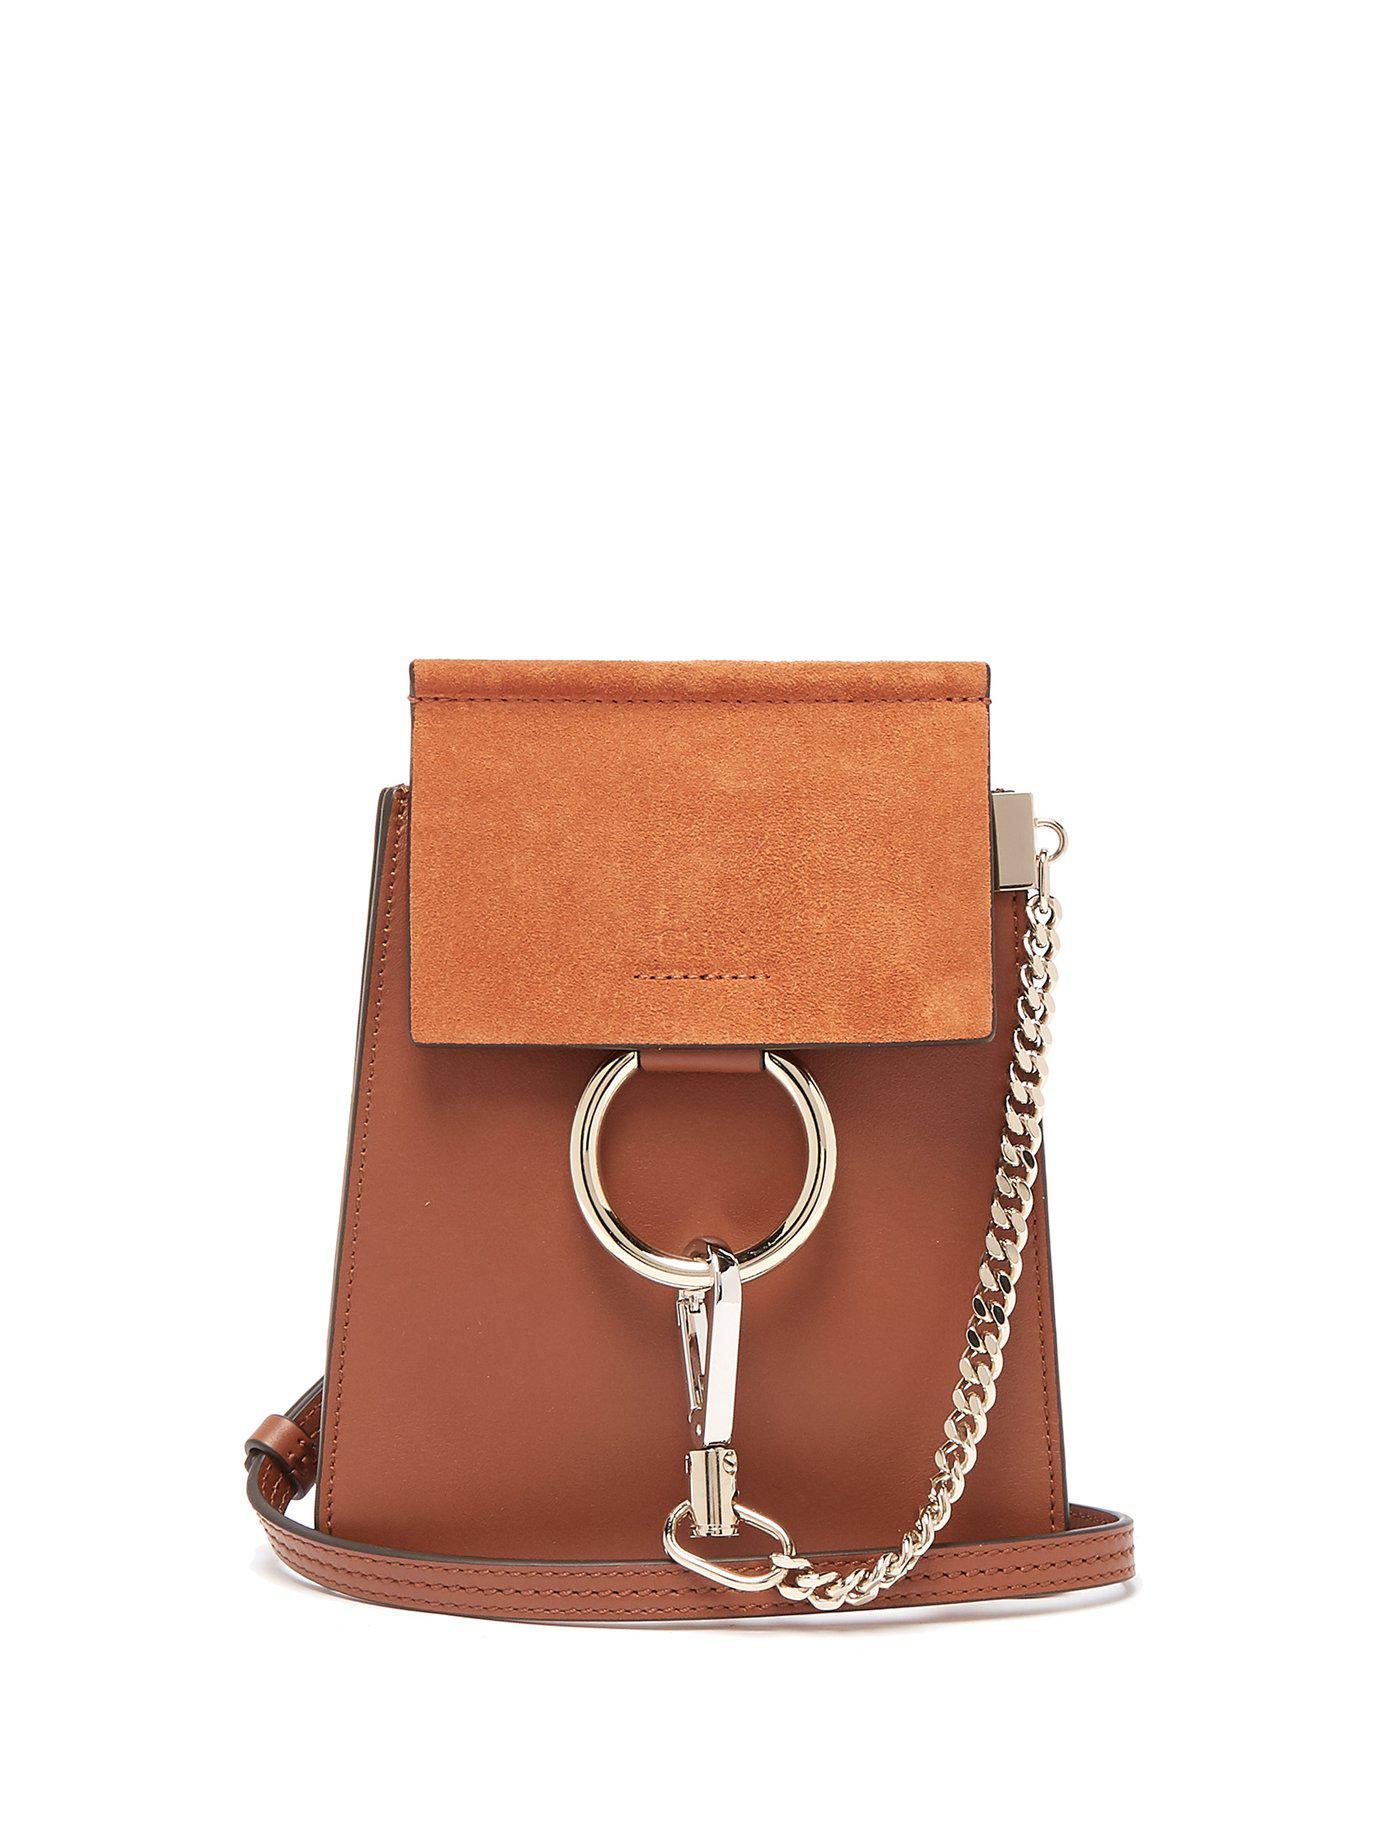 8fa21dcd61 Lyst - Chloé Faye Mini Suede Panel Leather Cross Body Bag in Brown